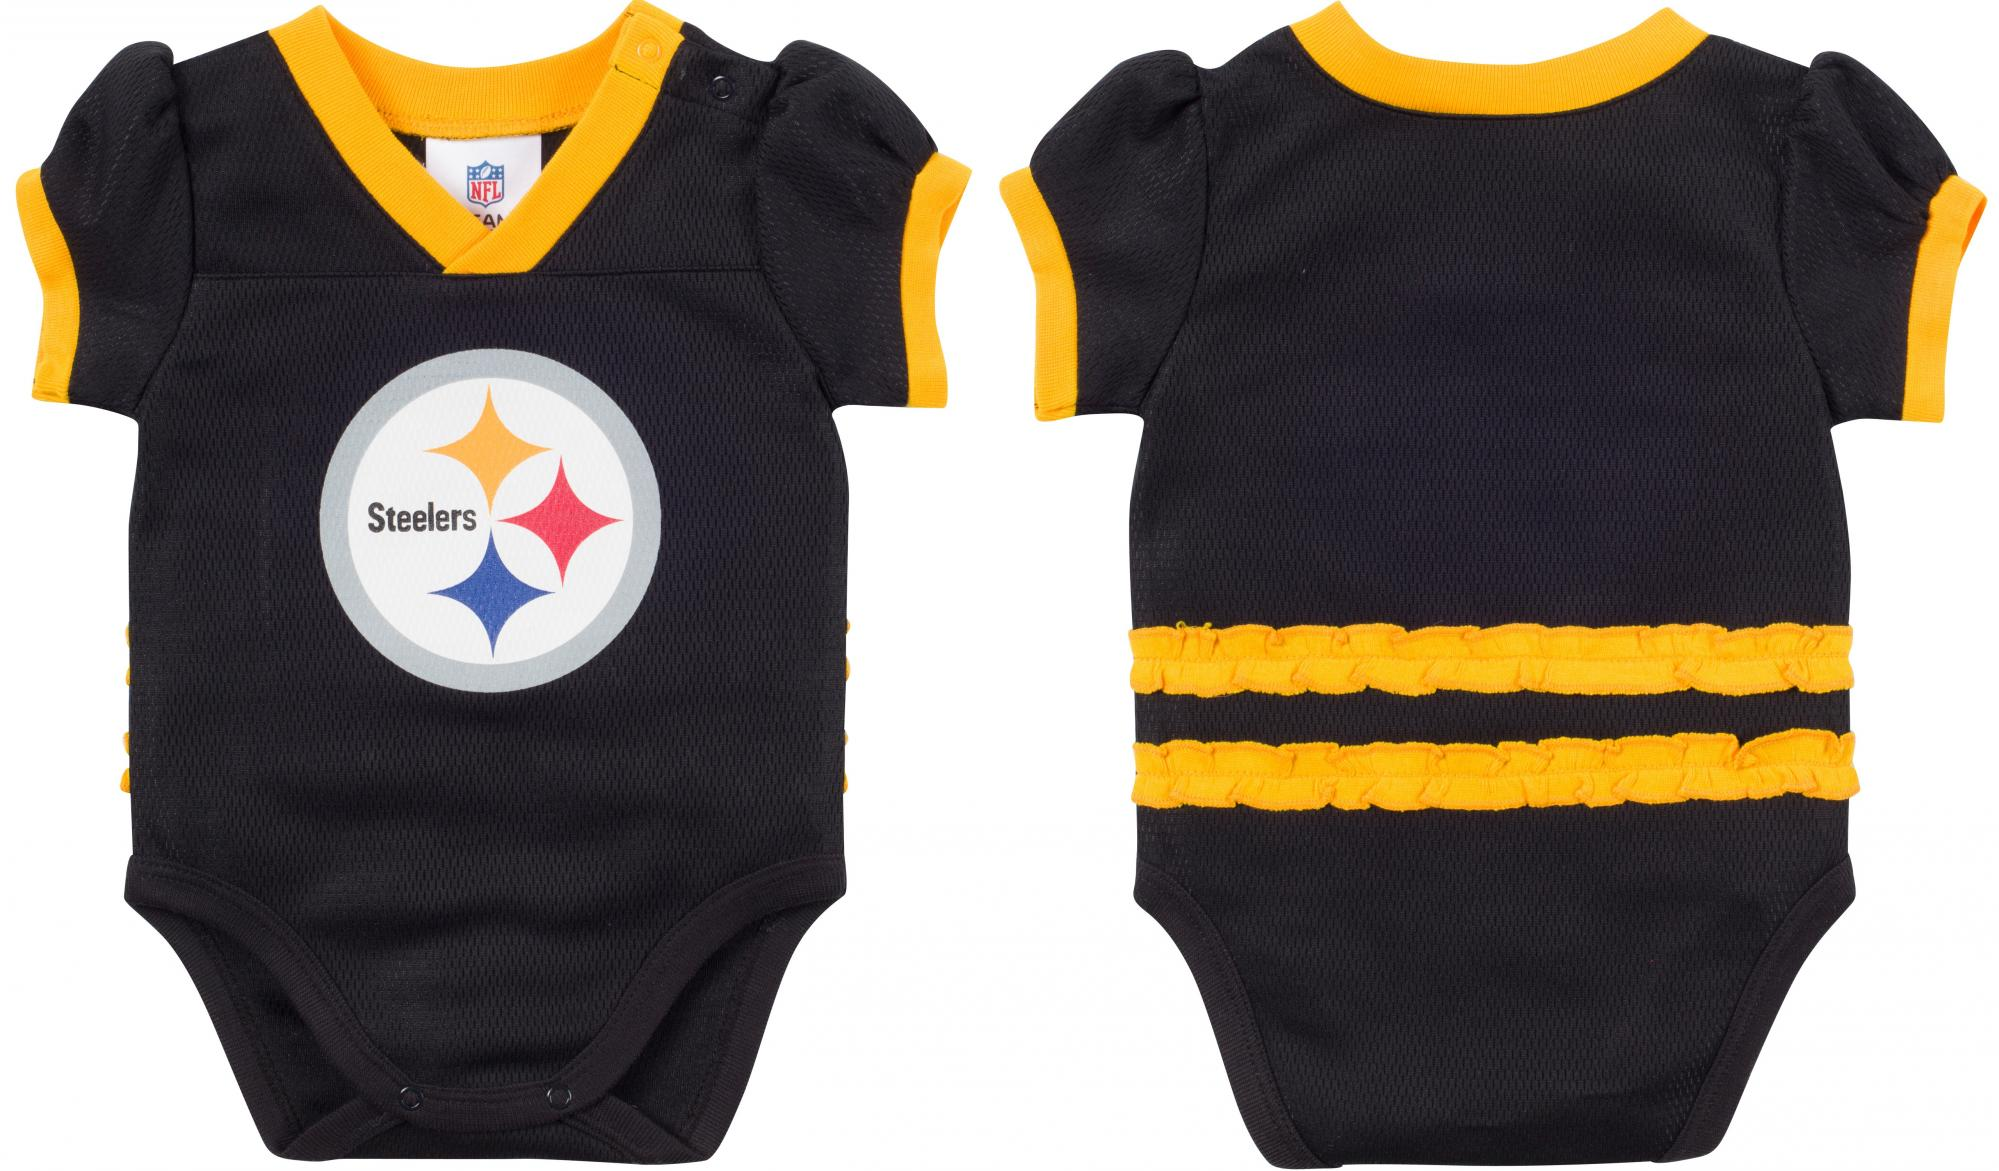 steelers-baby-rufflebutt-player-jersey-bodysuit-1680-all.jpg